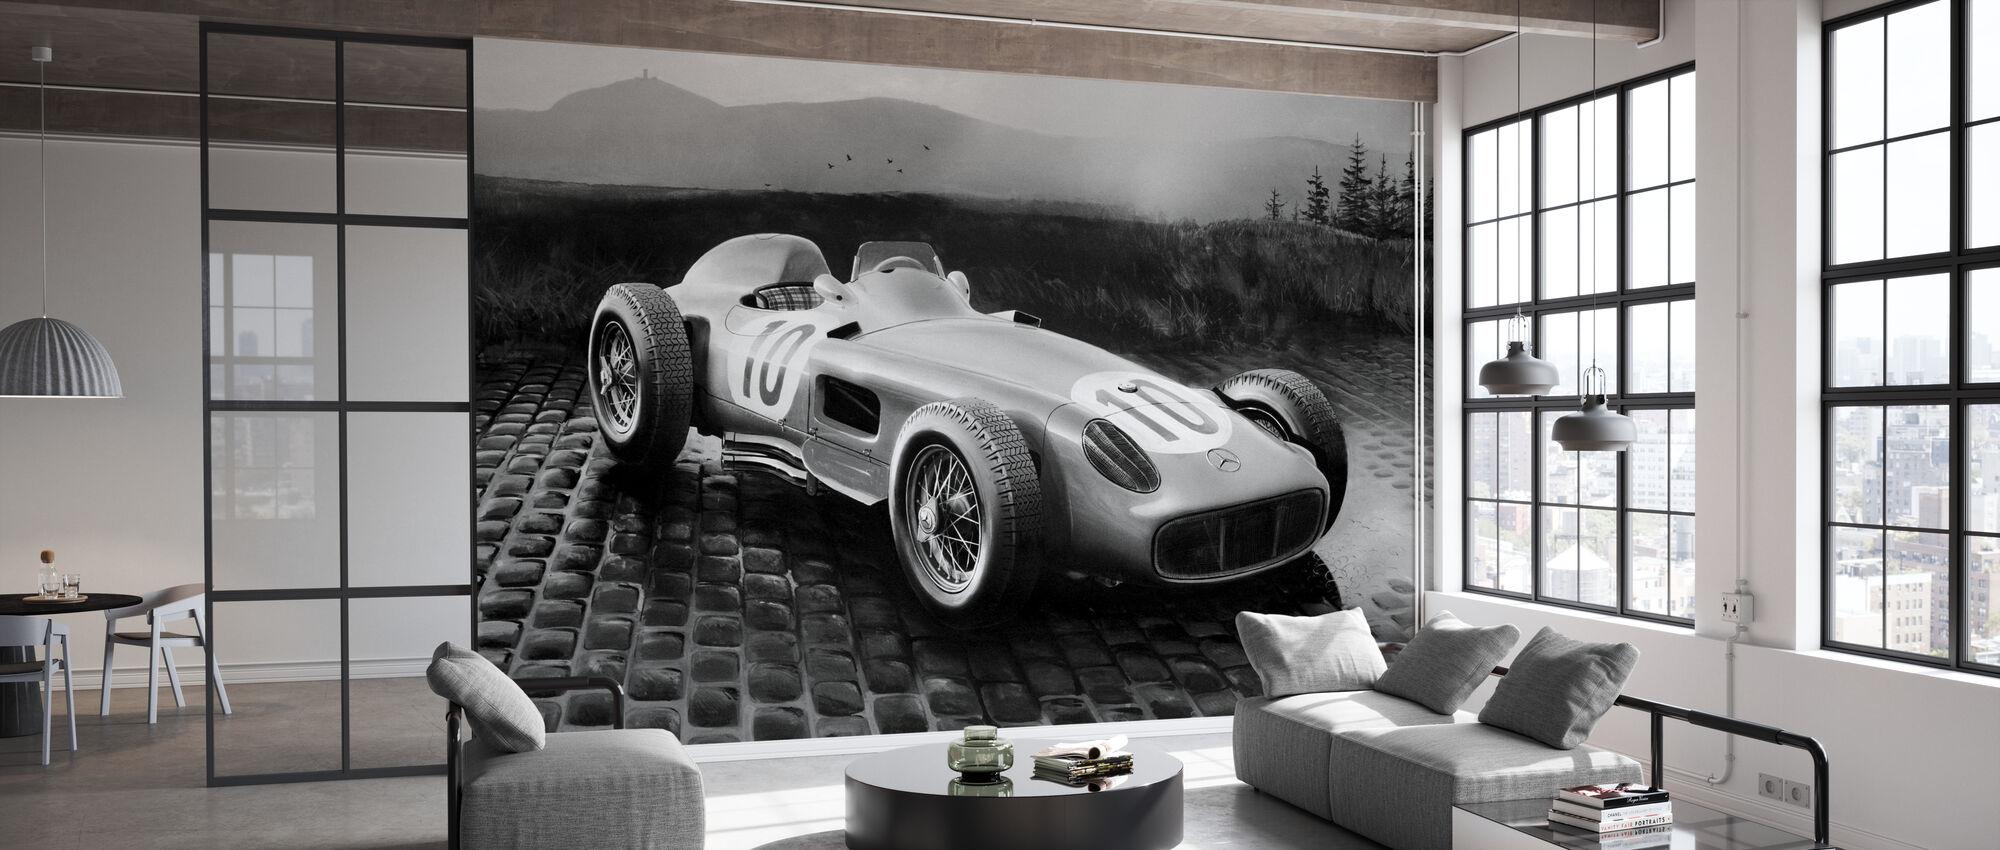 Car 1954 BW - Wallpaper - Office